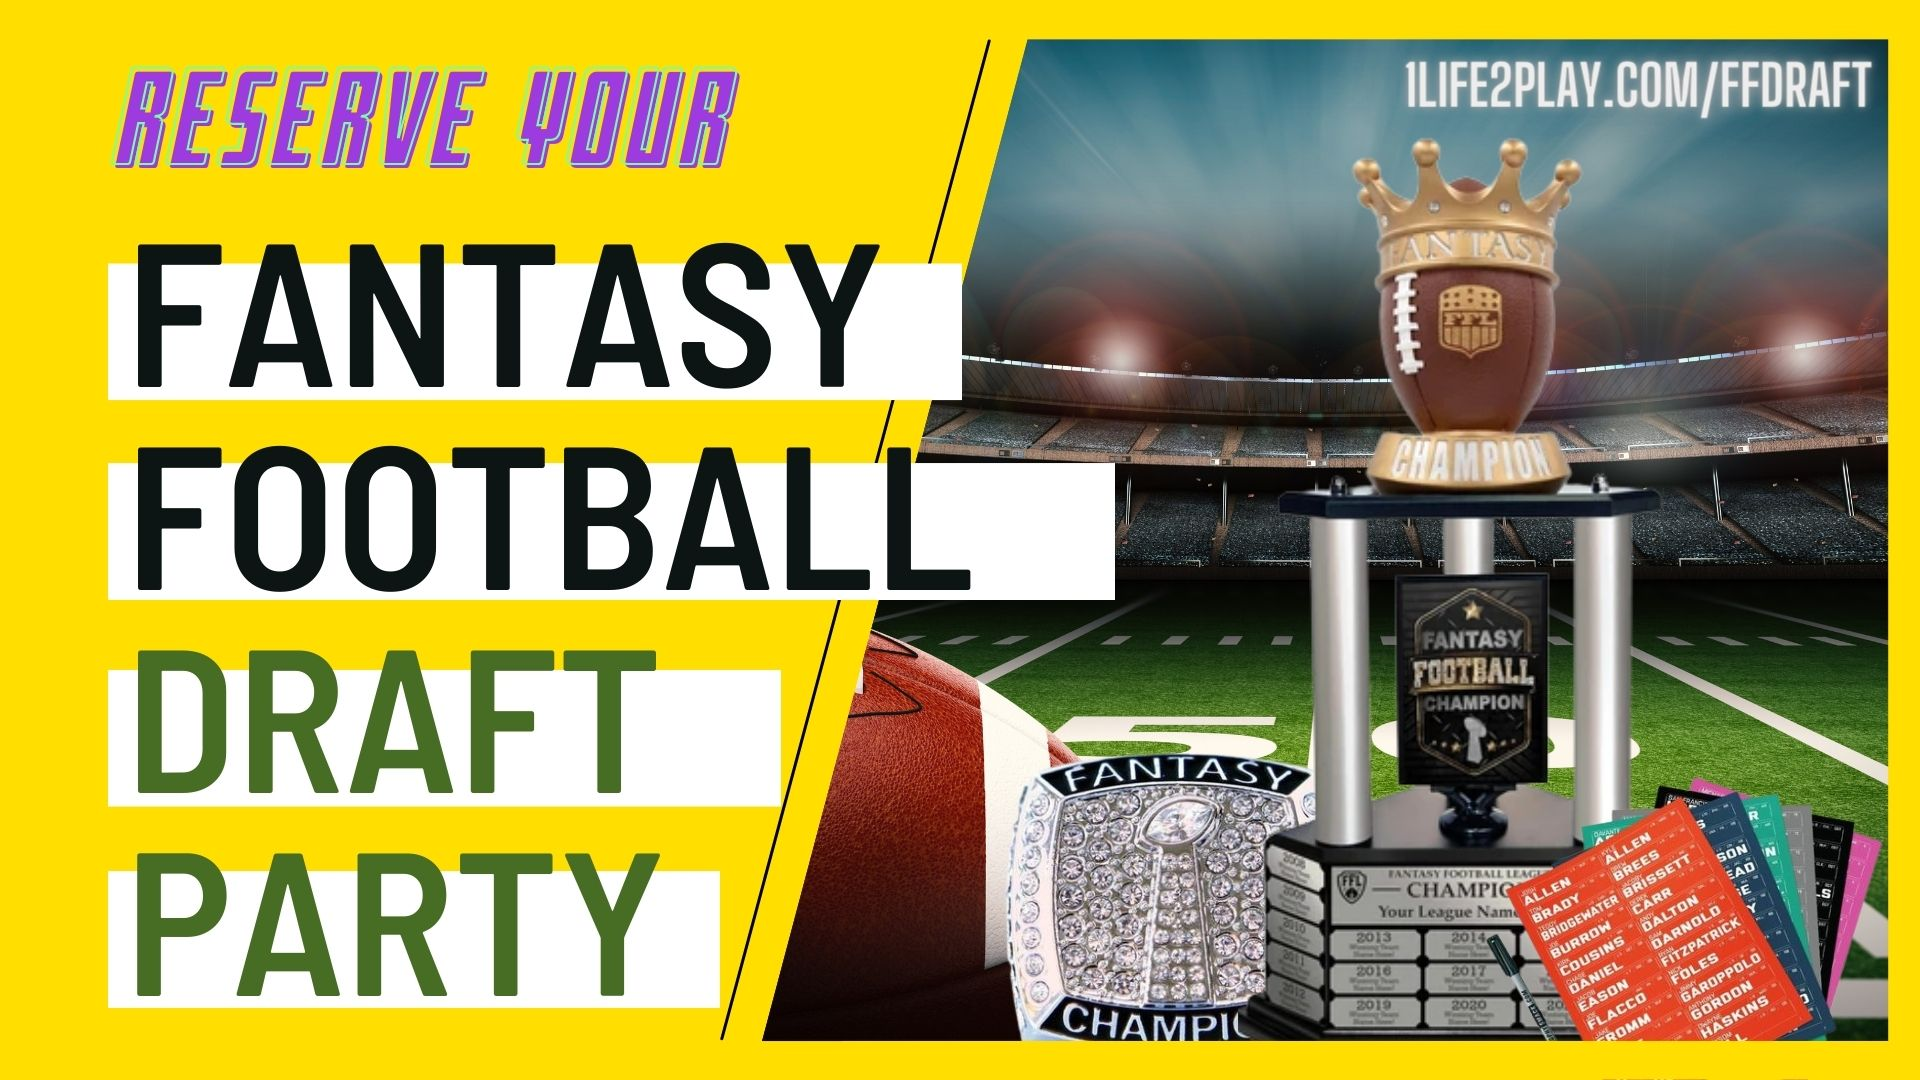 - Fantasy Football Large Ad 1 - Home